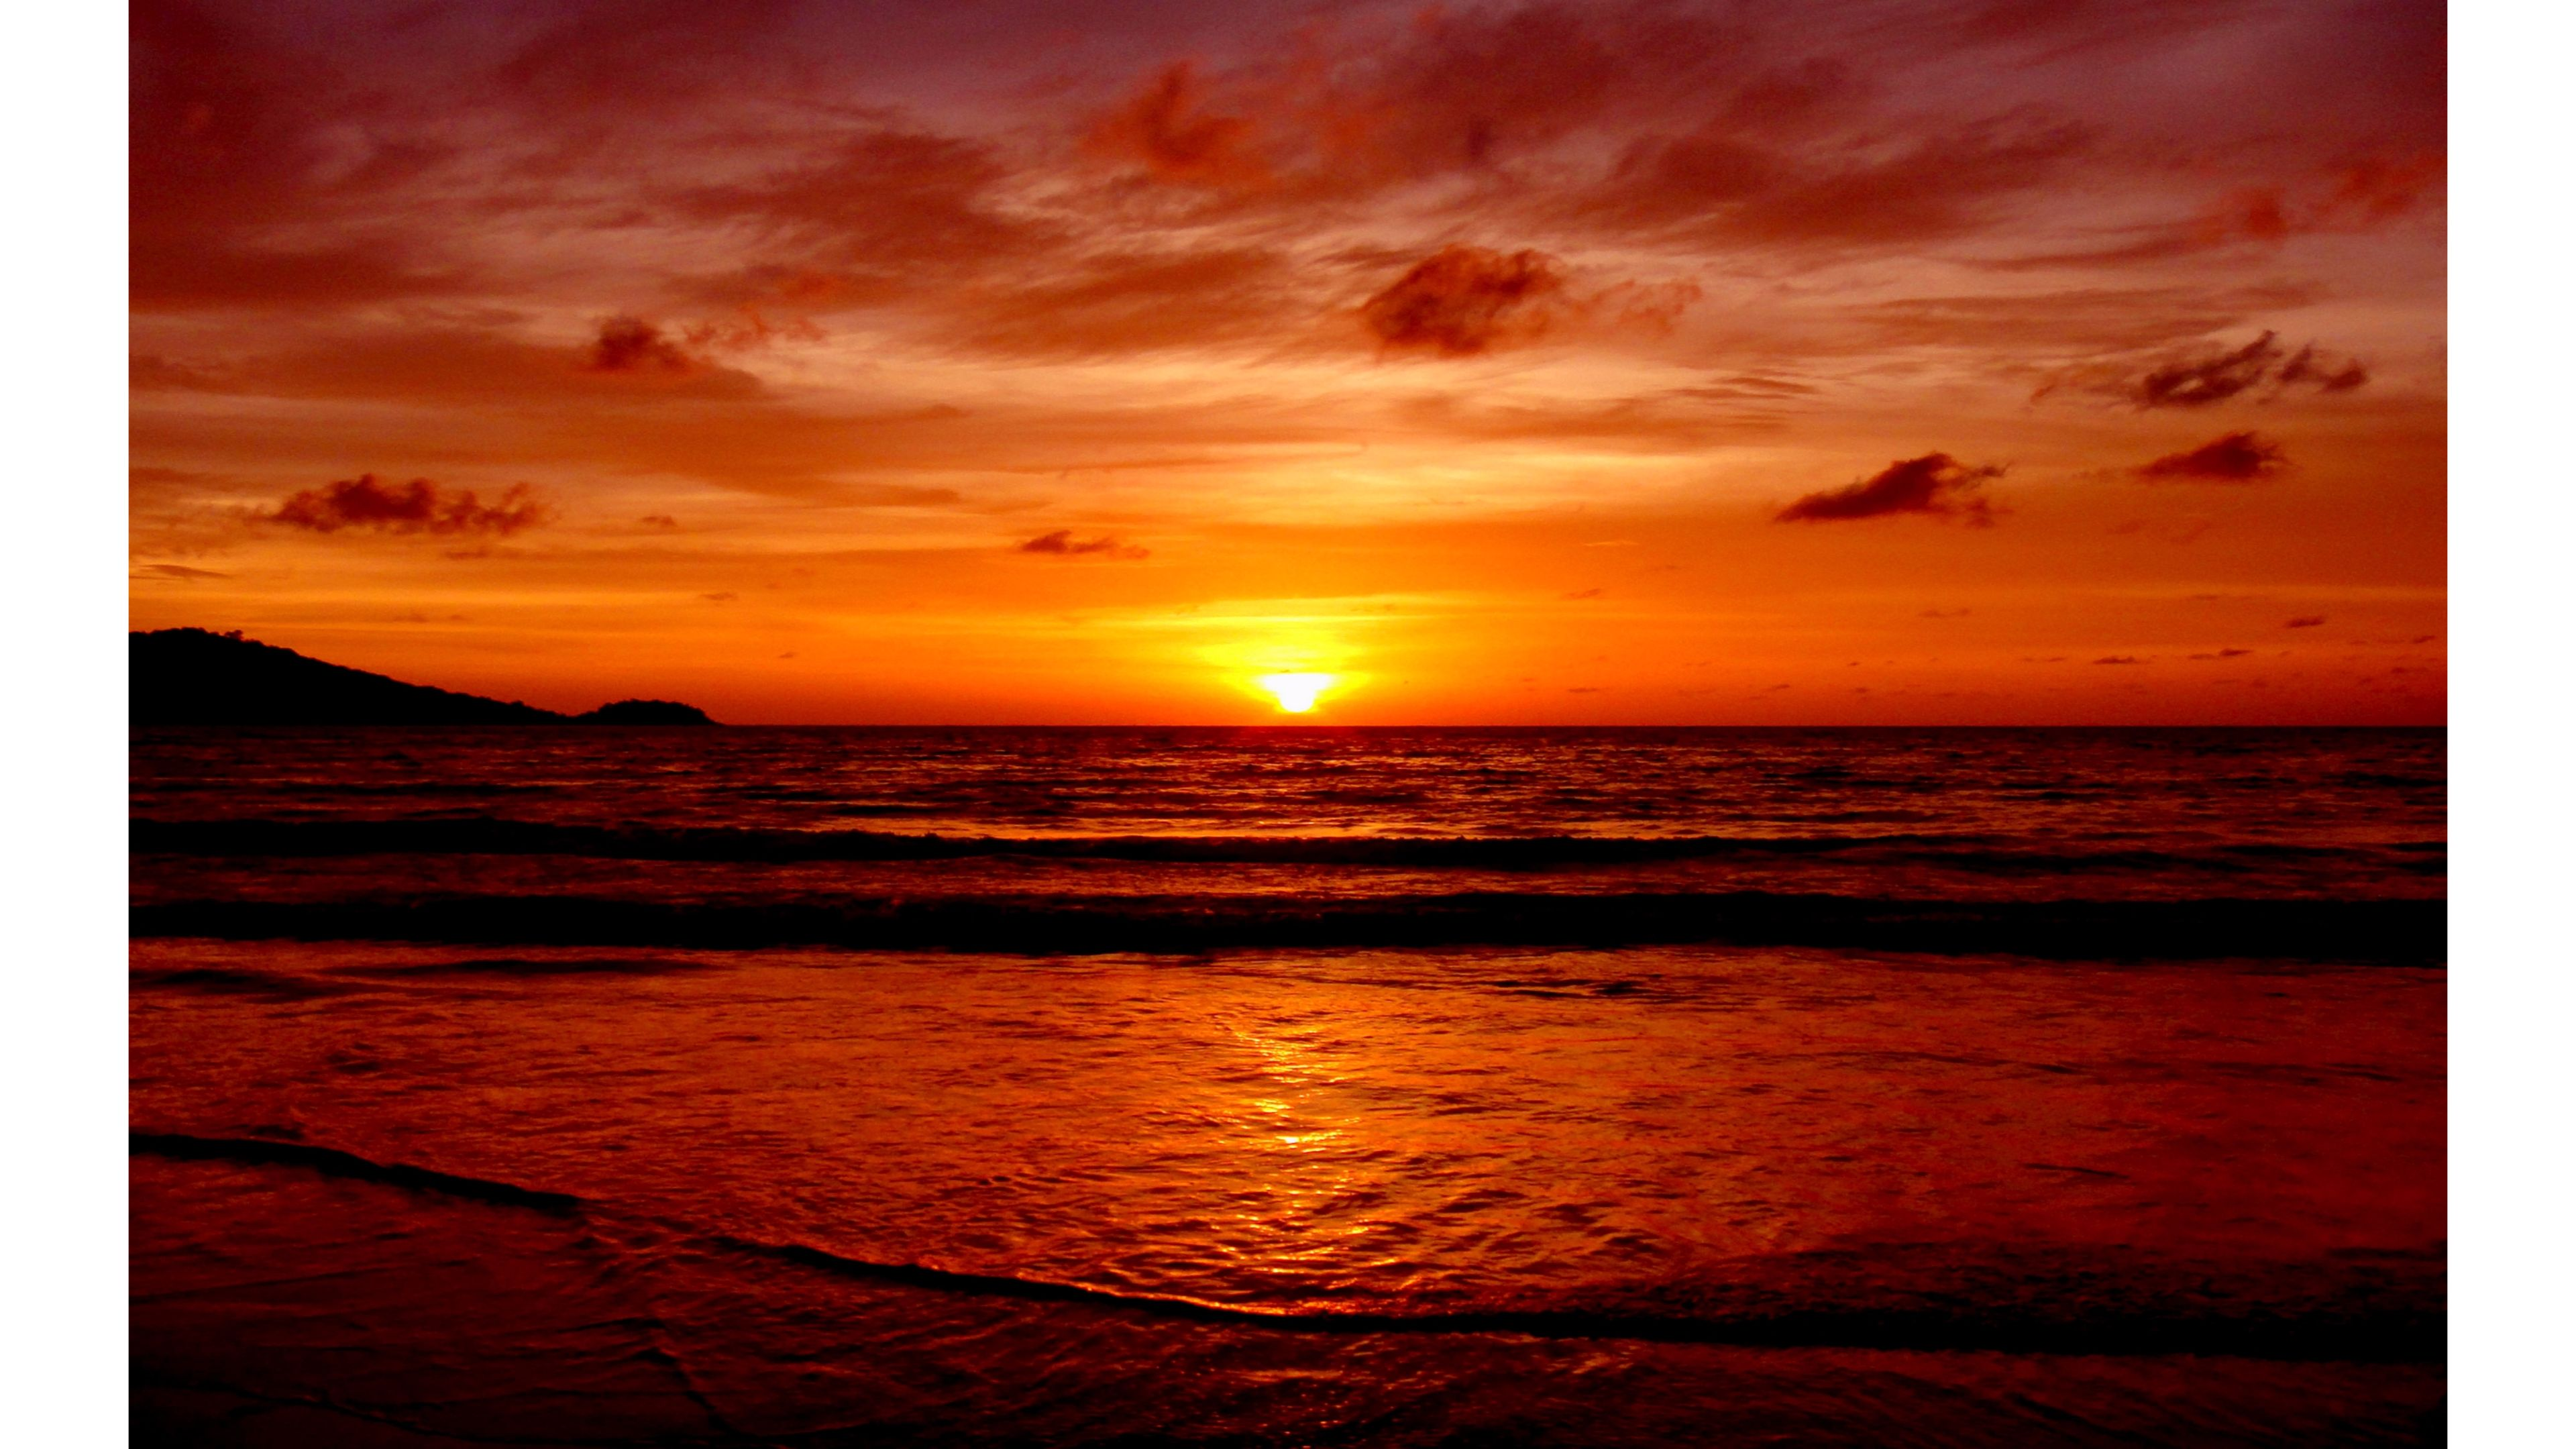 Sunset Wallpaper 4k Posted By Samantha Walker